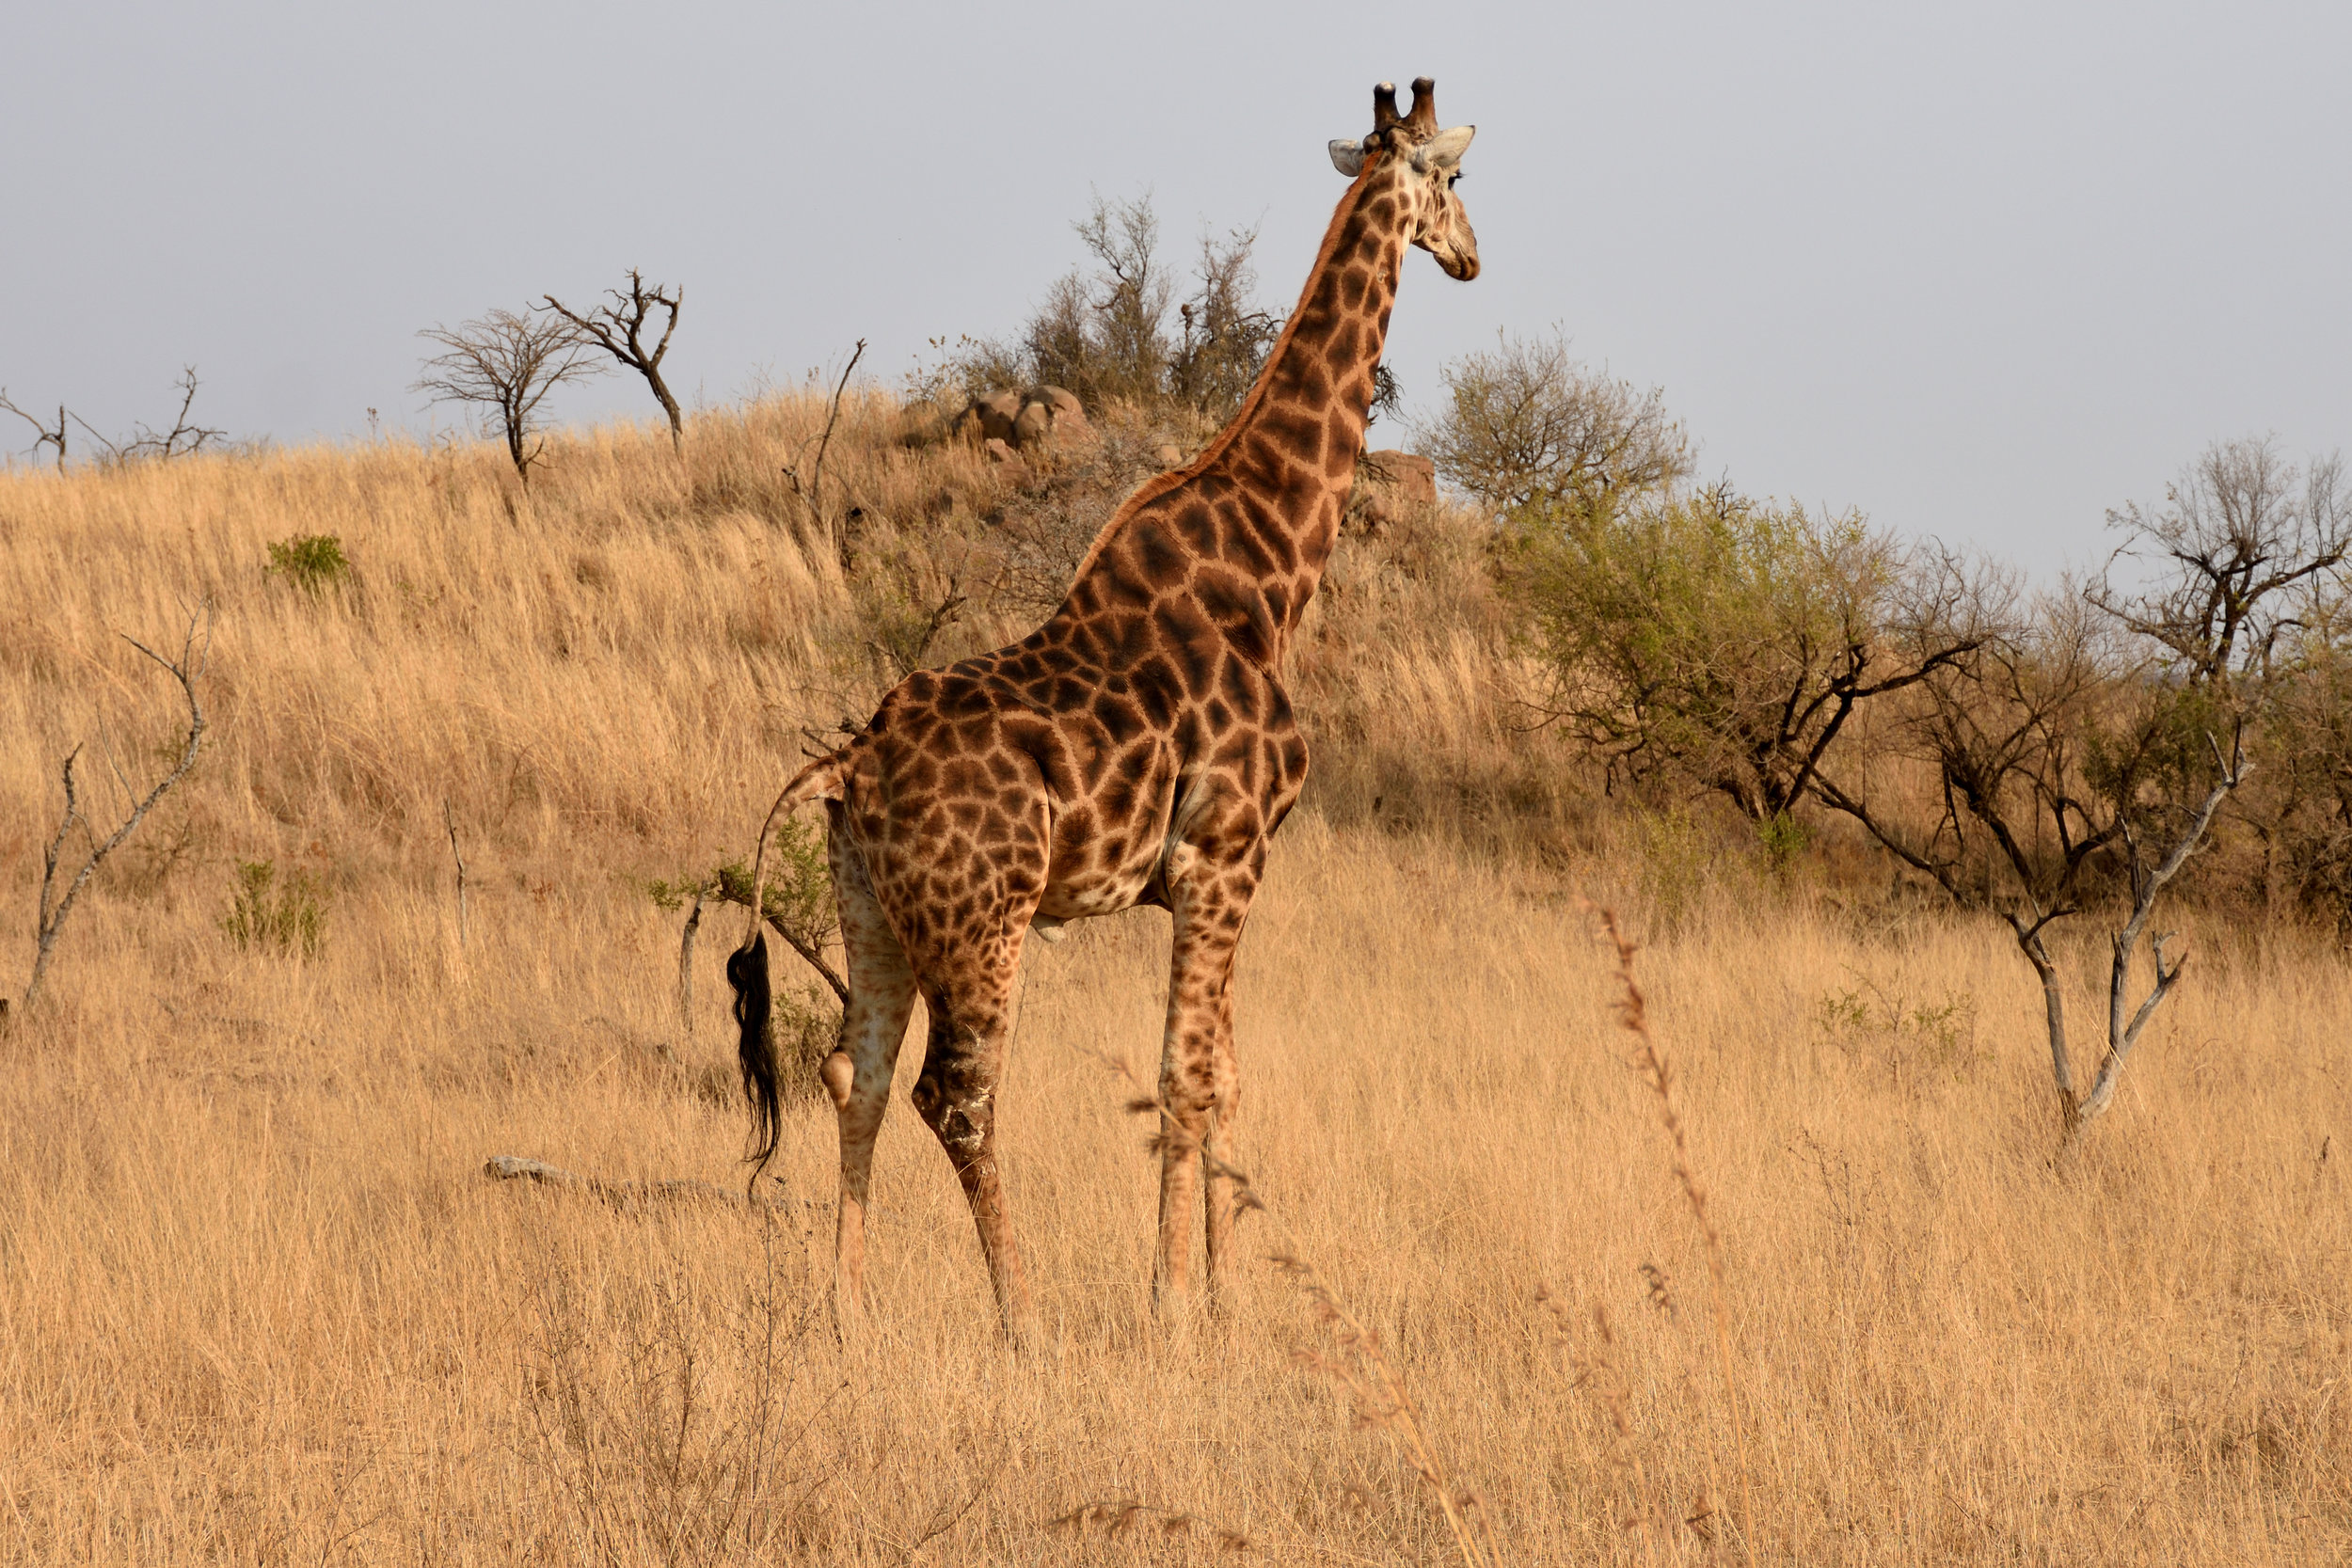 Nambiti Game Reserve, South Africa, September 2017